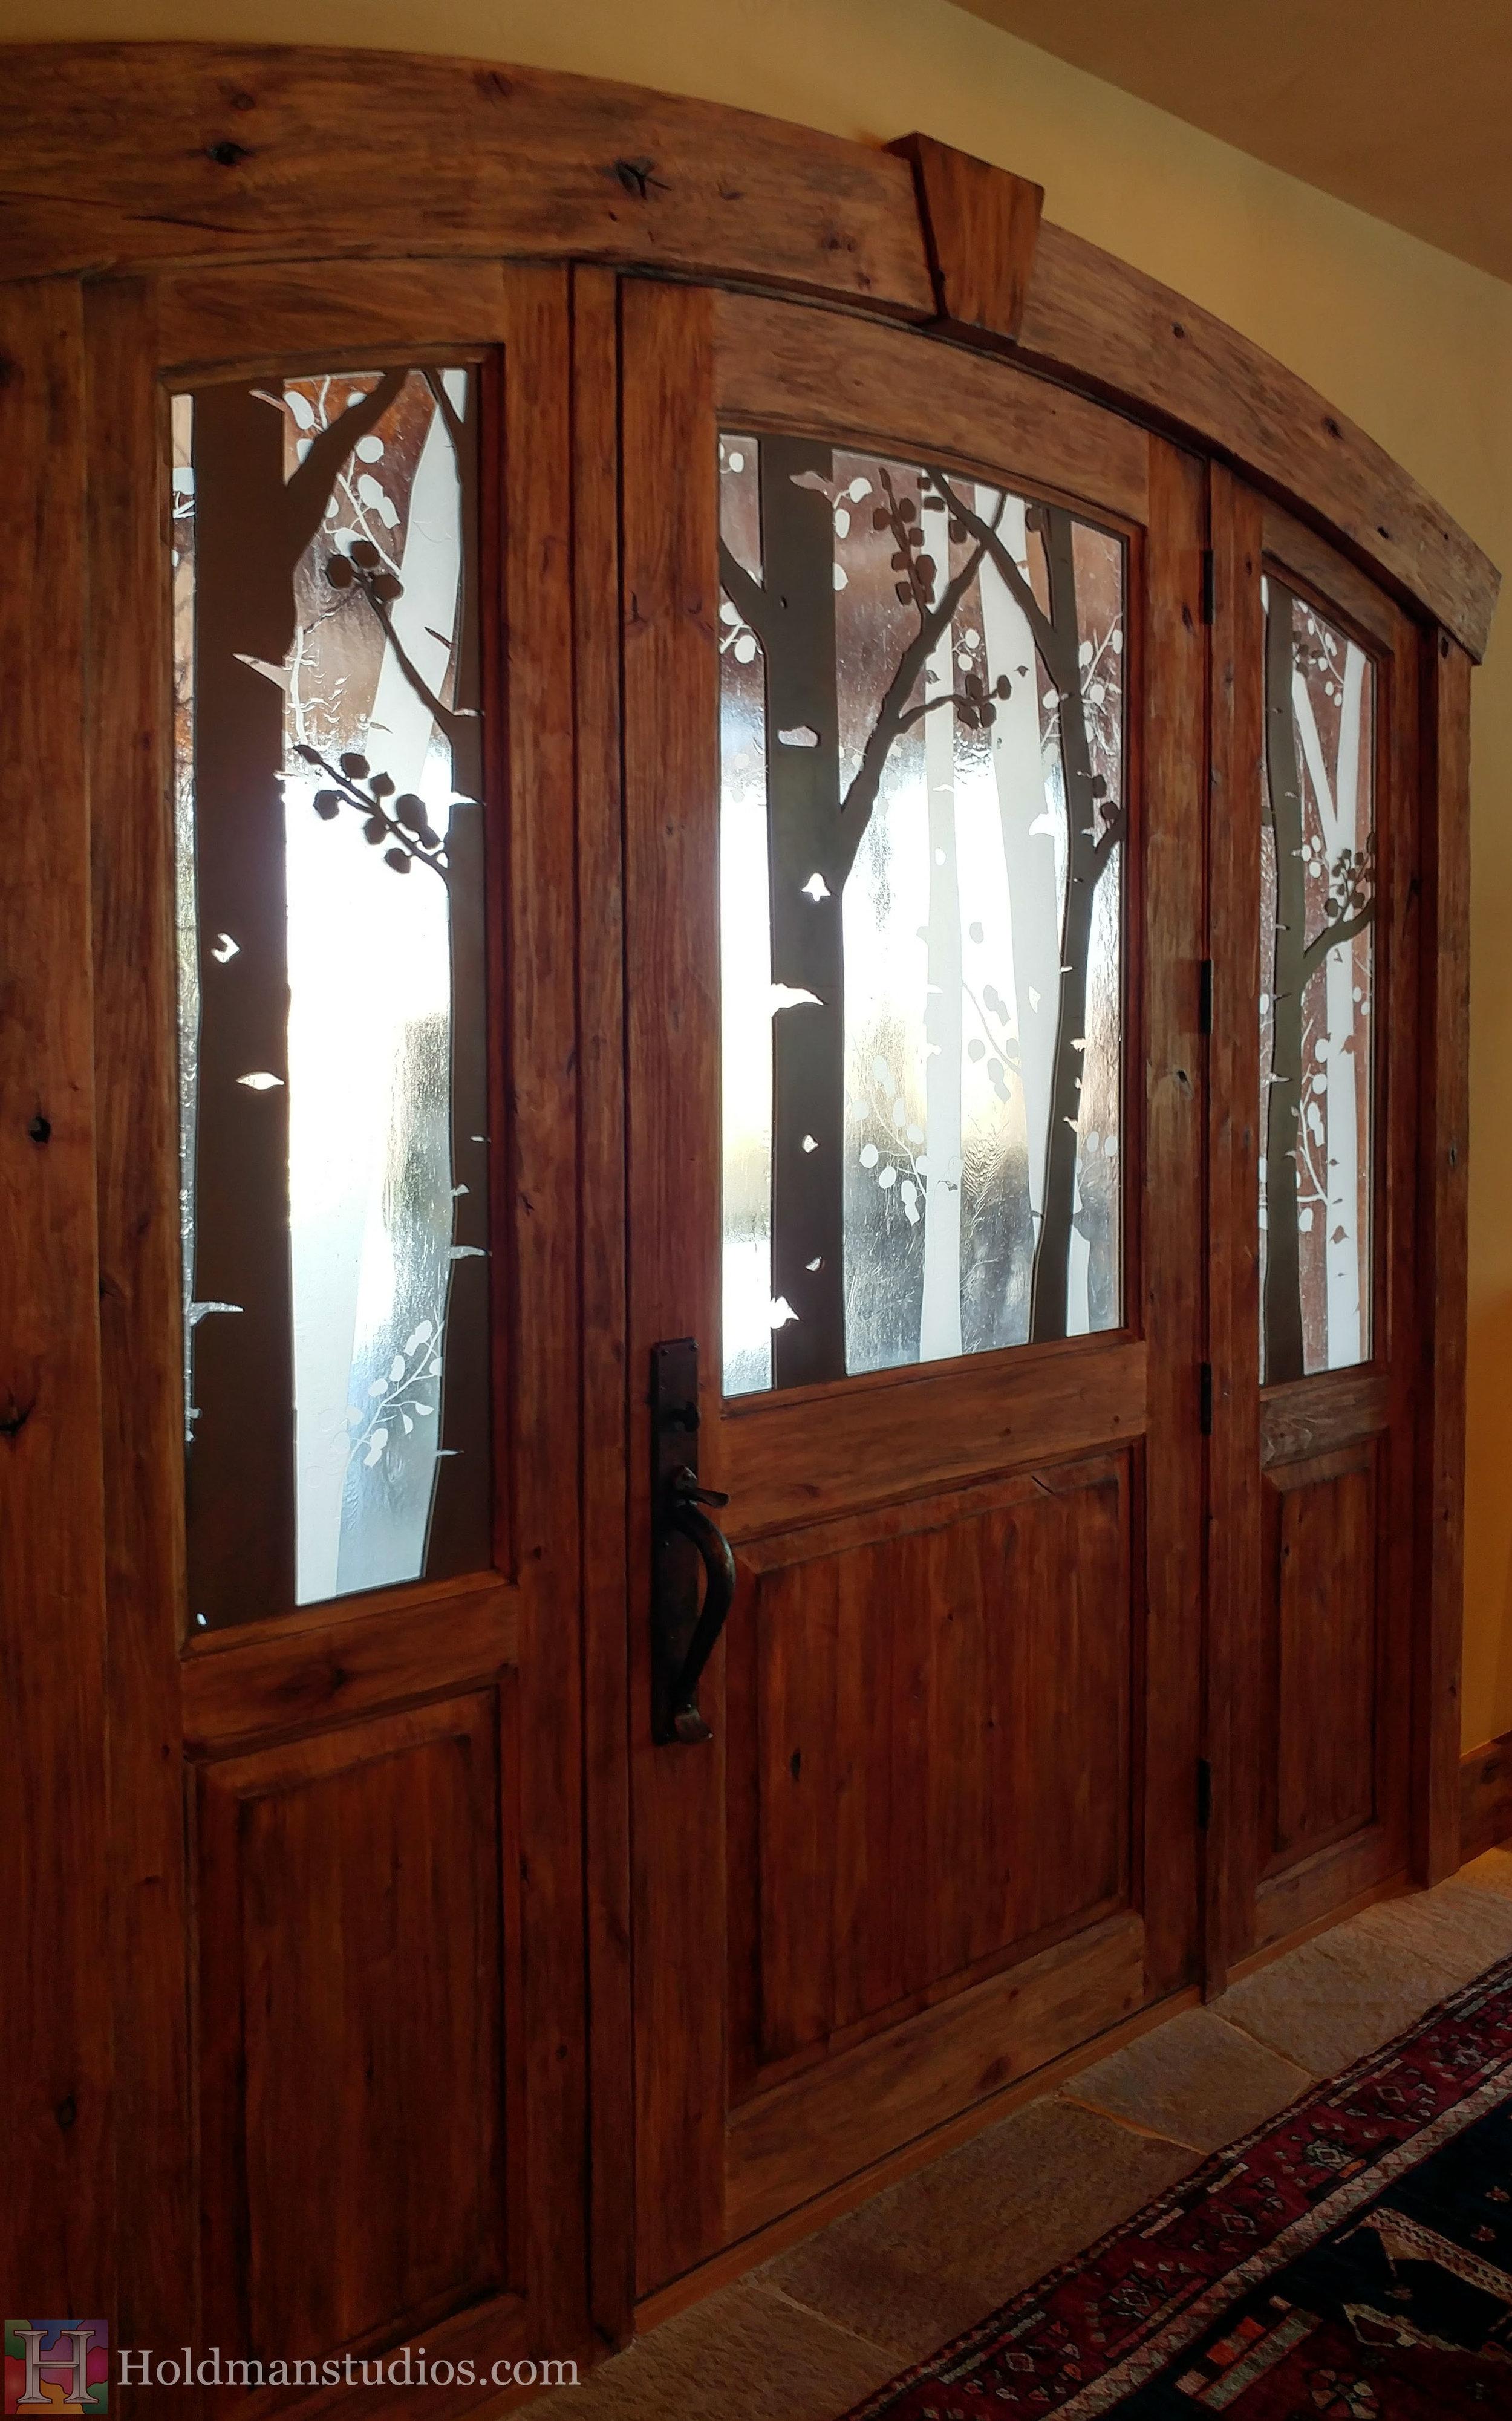 Holdman-studios-etched-art-glass-front-door-windows-aspen-trees-leaves-inside-left.jpg